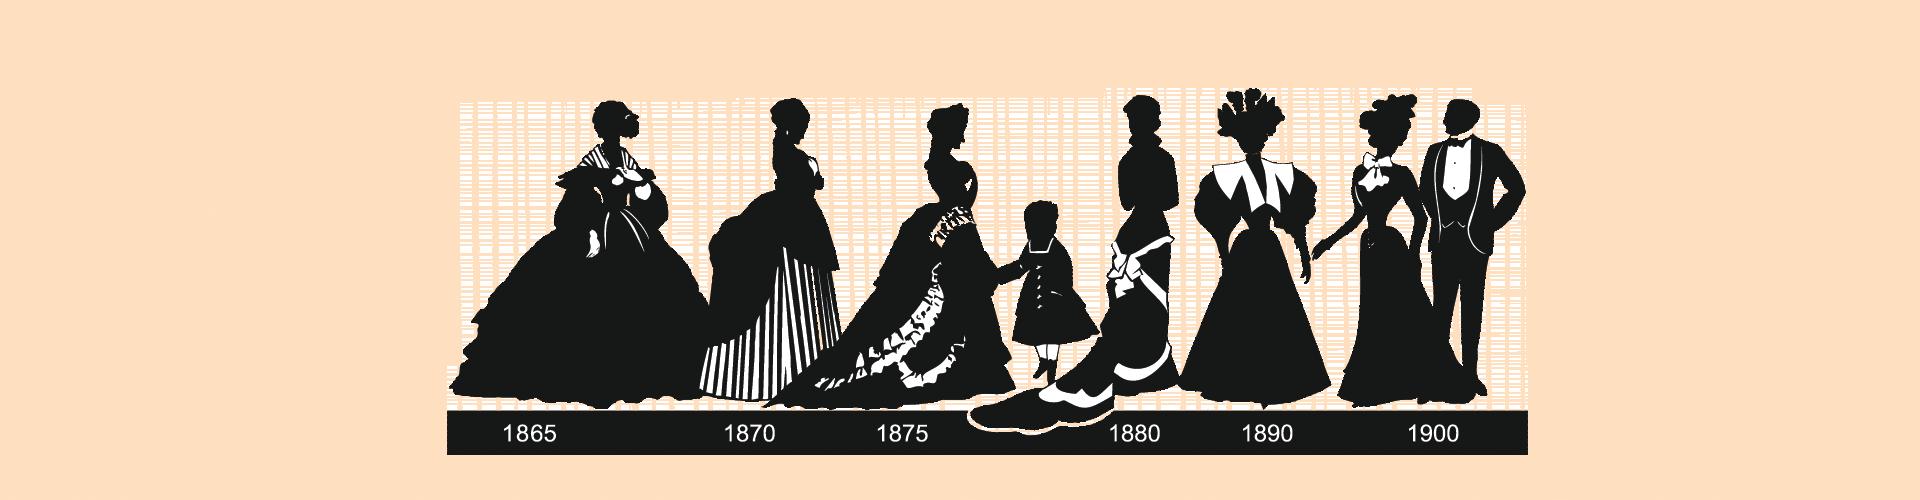 1865 to 1900